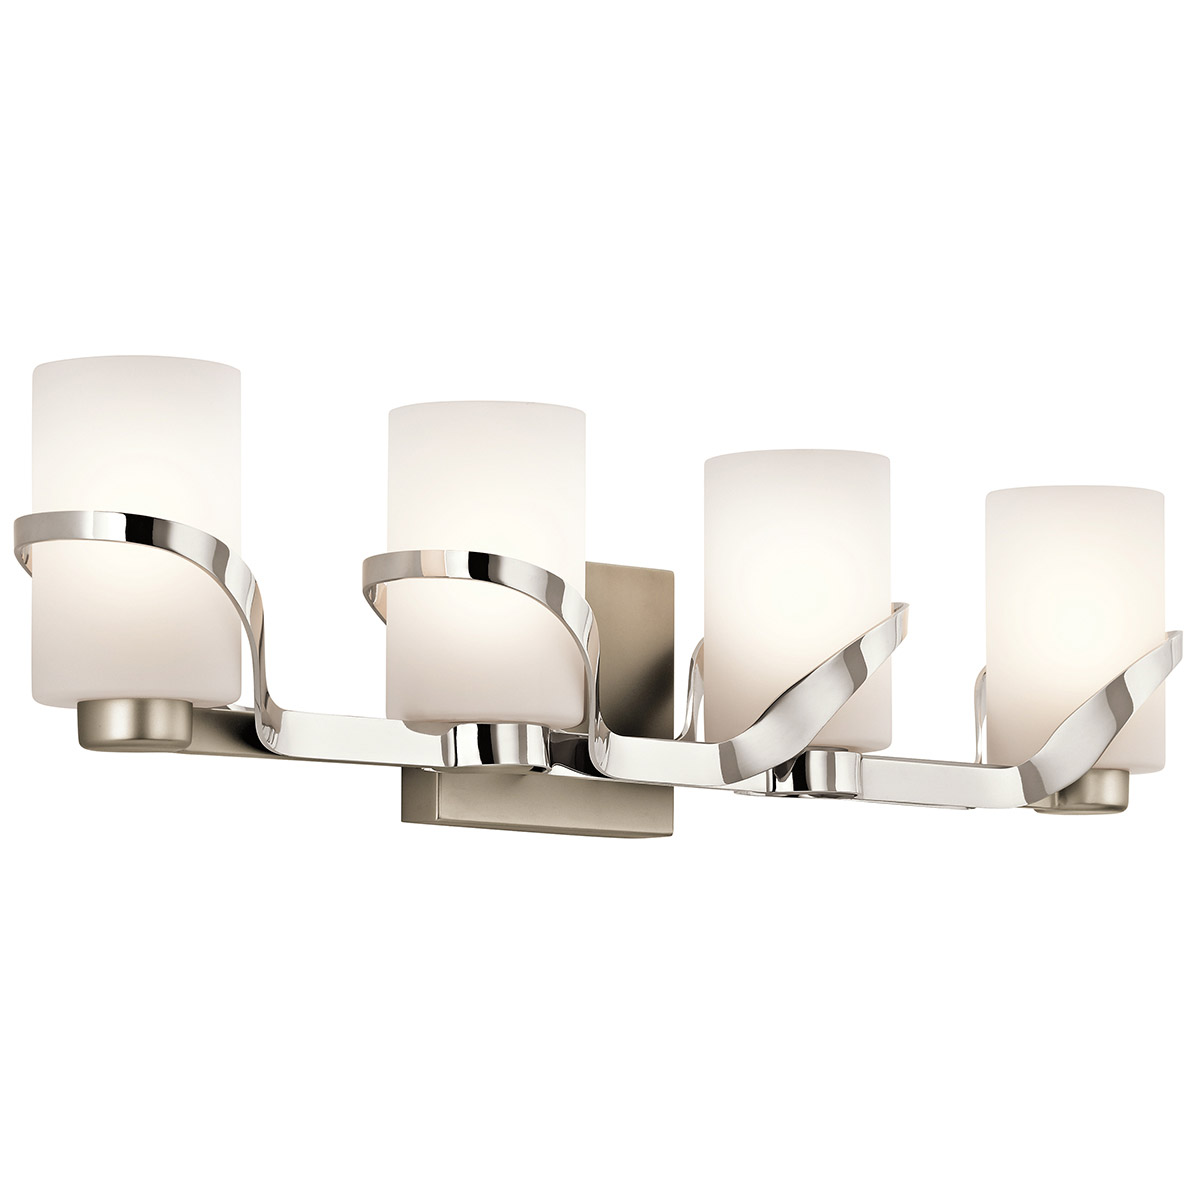 Kichler 45630pn stelata bathroom vanity light aloadofball Choice Image